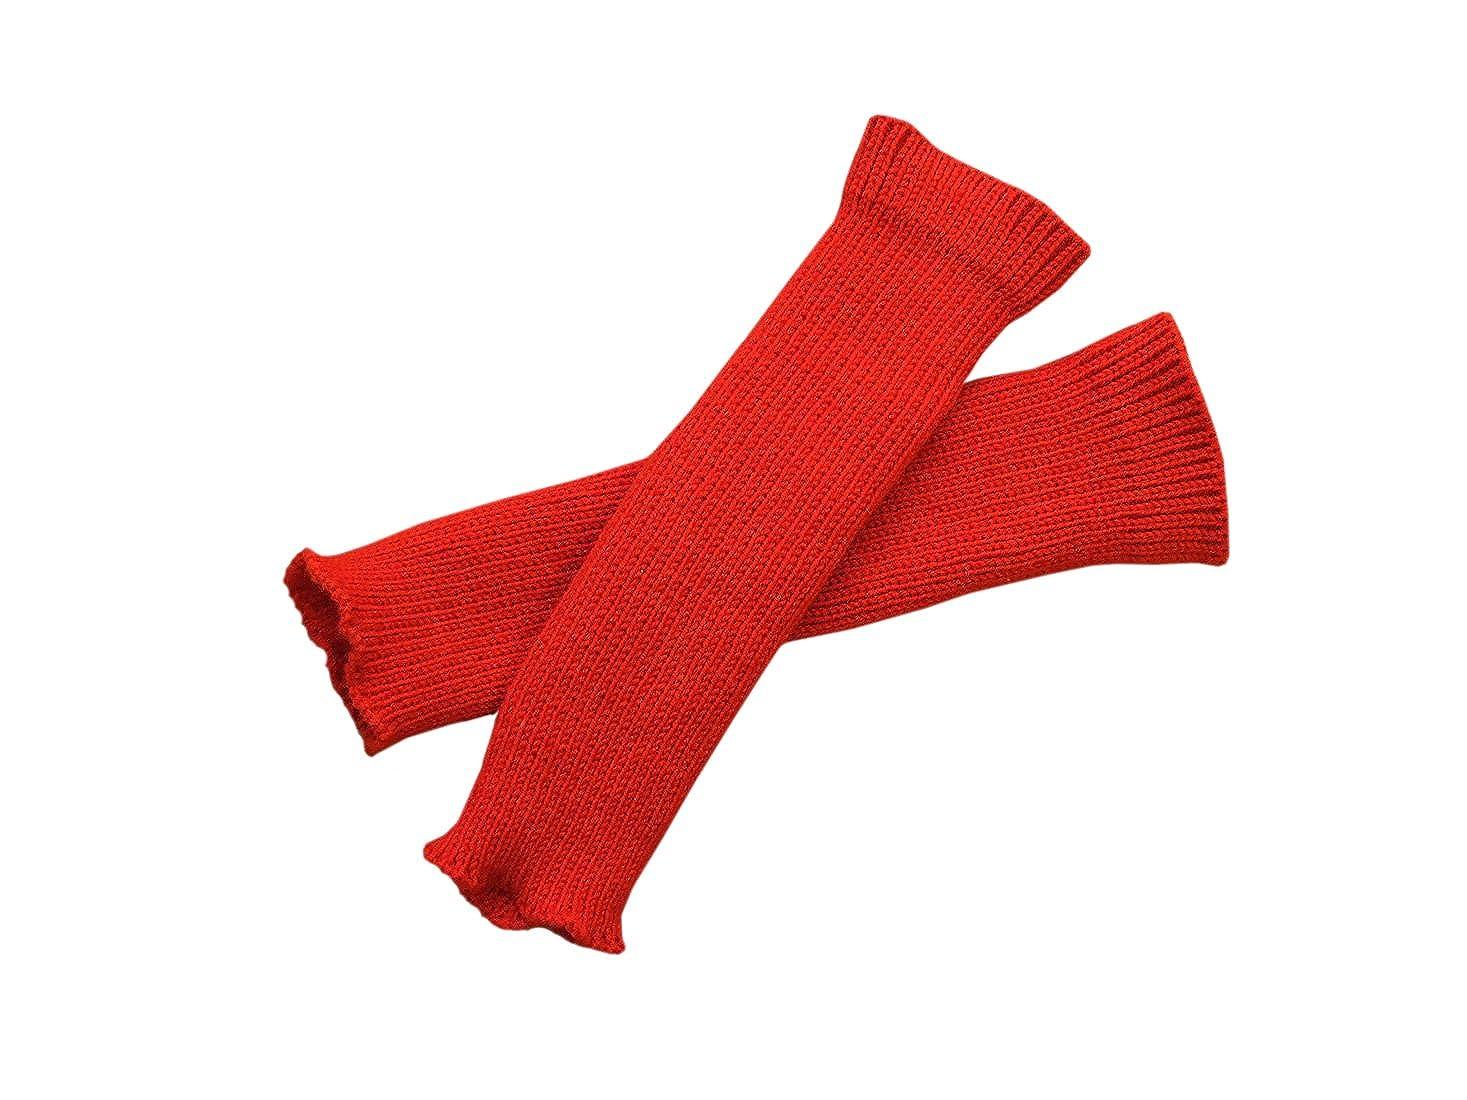 100/% merino wool adult women men arm warmers fingerless gloves mittens hand knitted